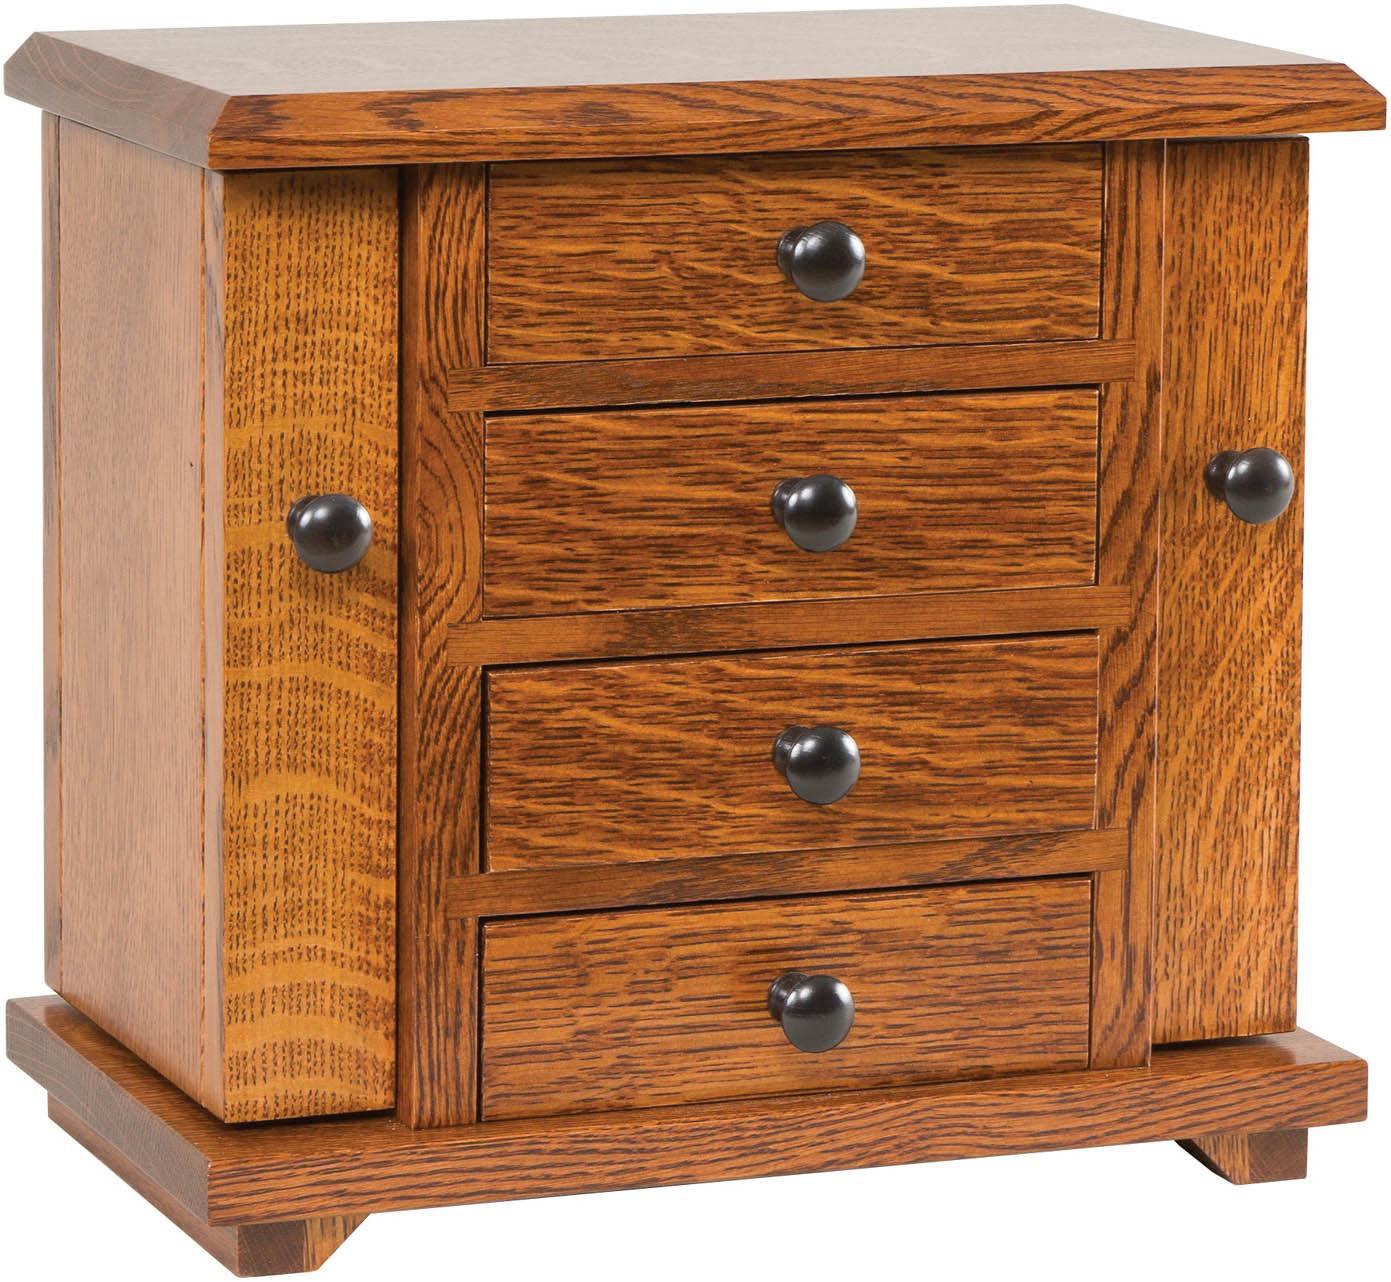 13 inch Dresser Top Jewelry Cabinet